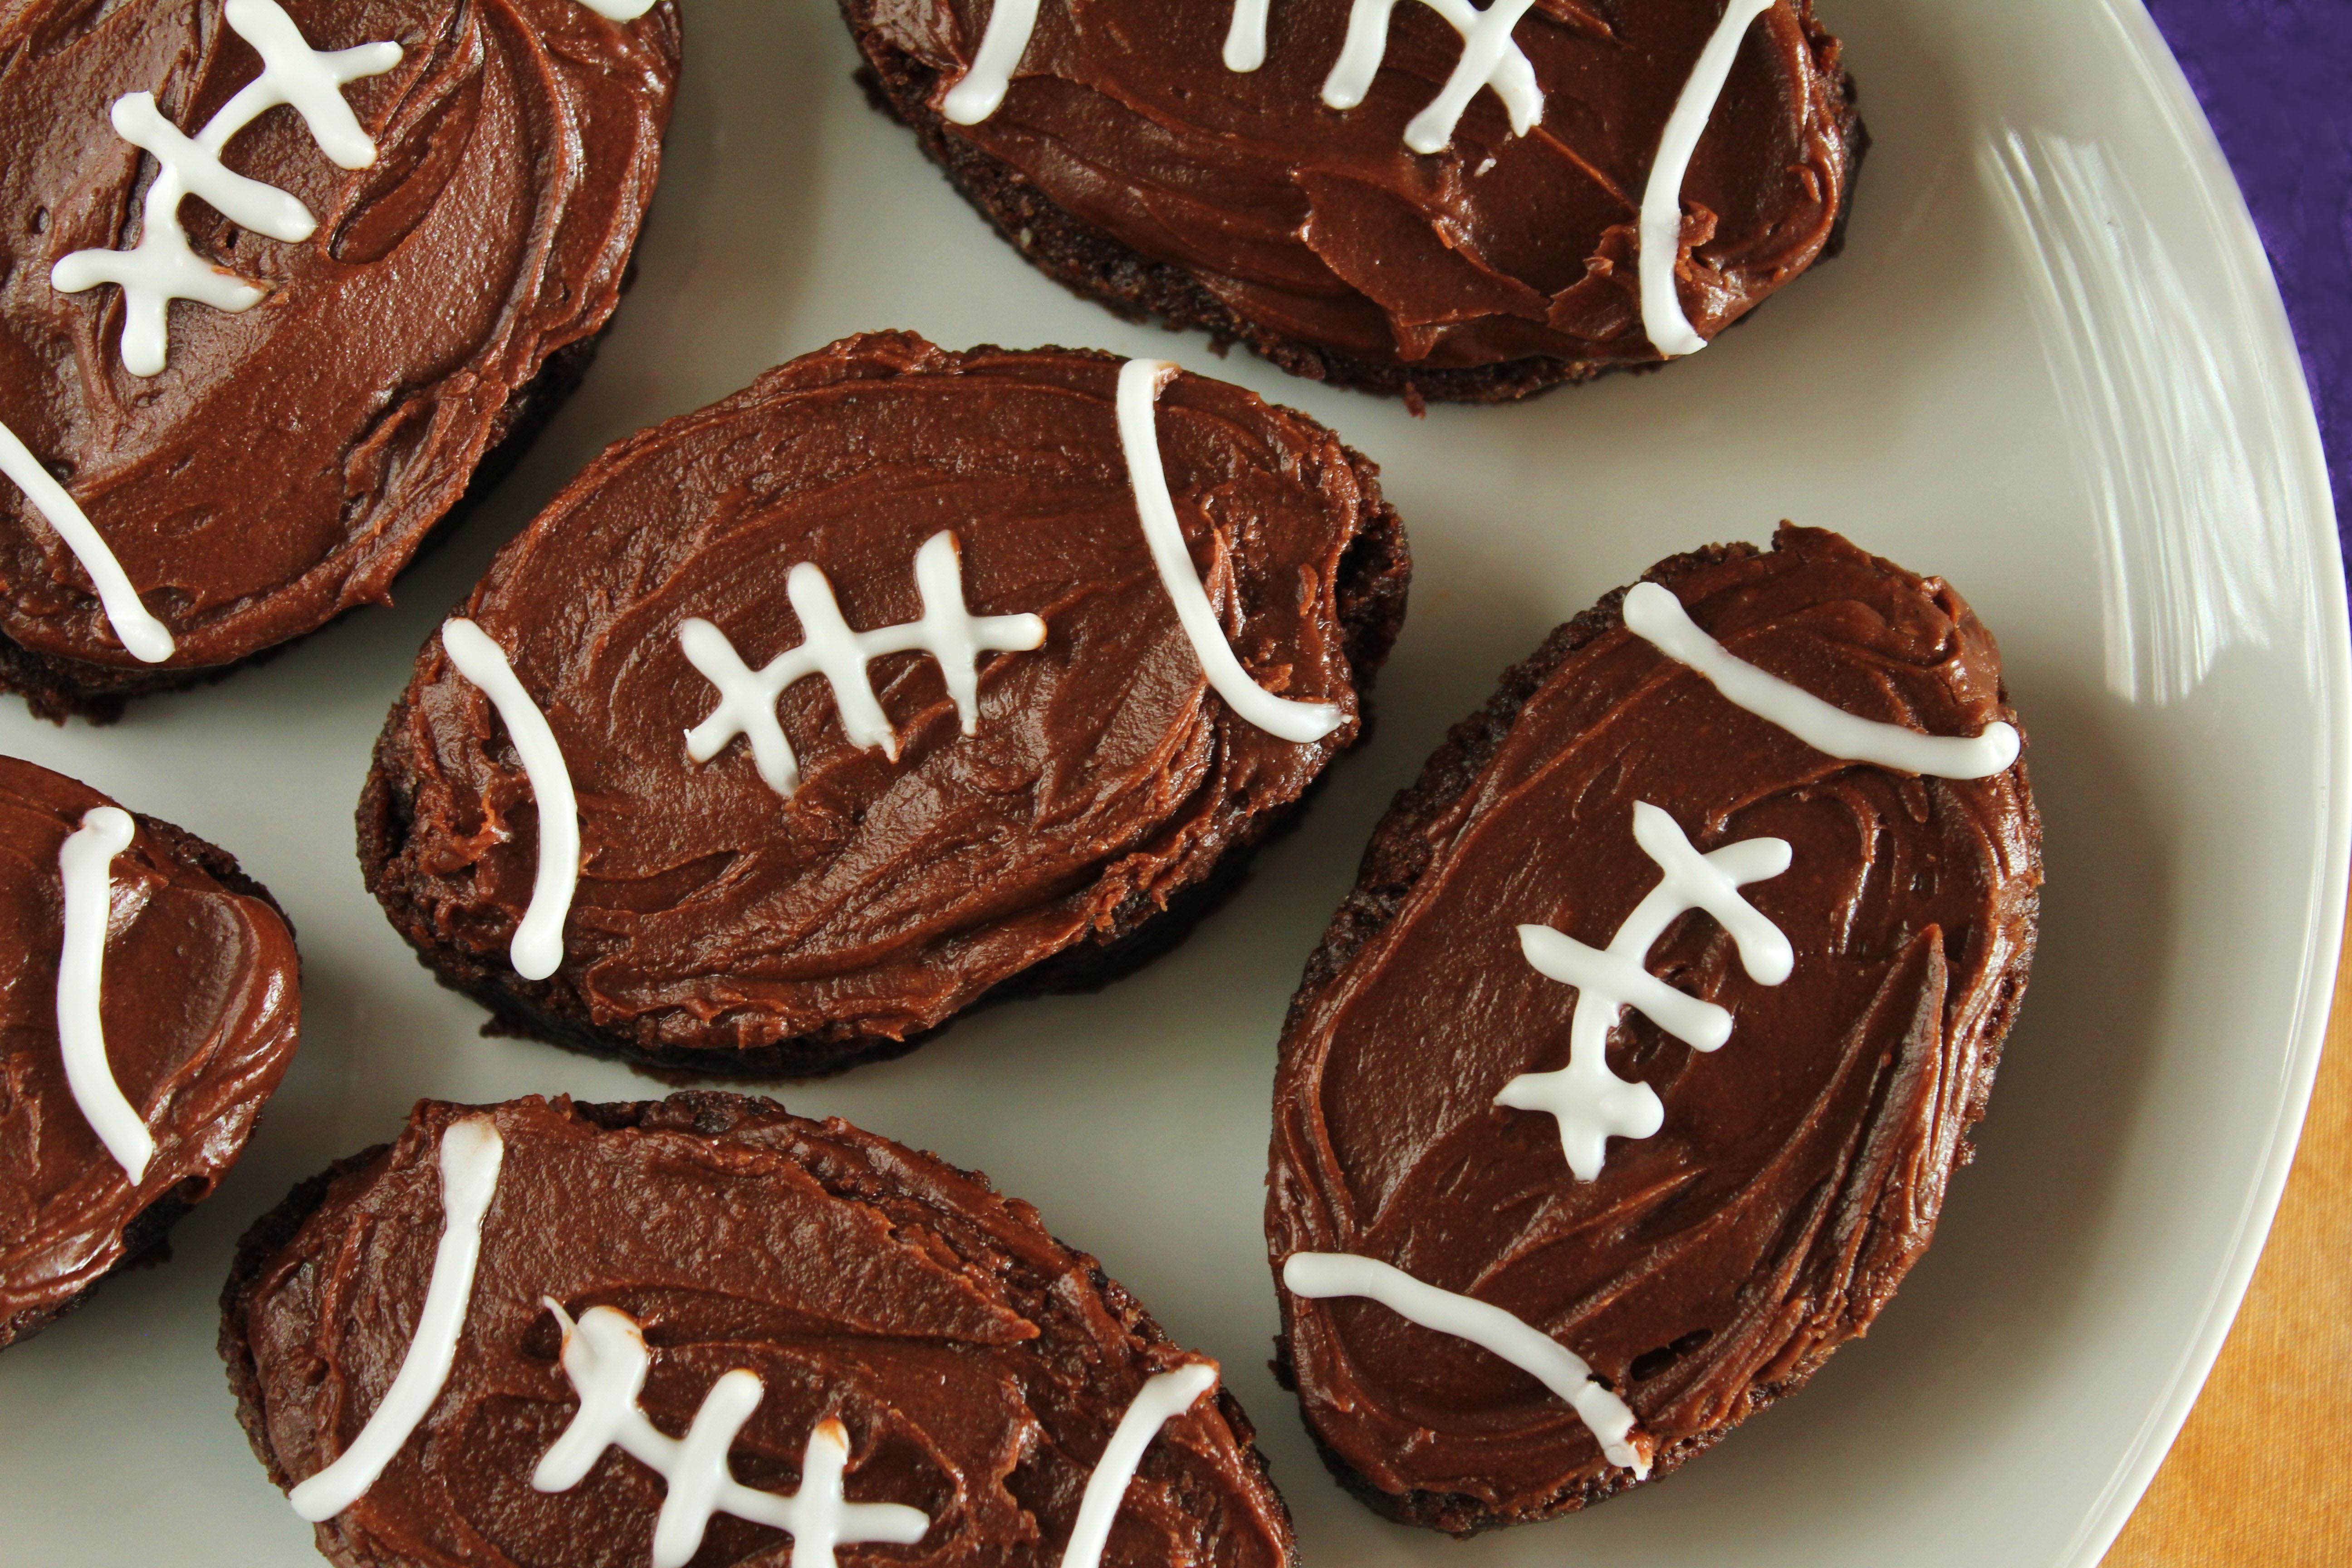 Football Shaped Chocolate Cake